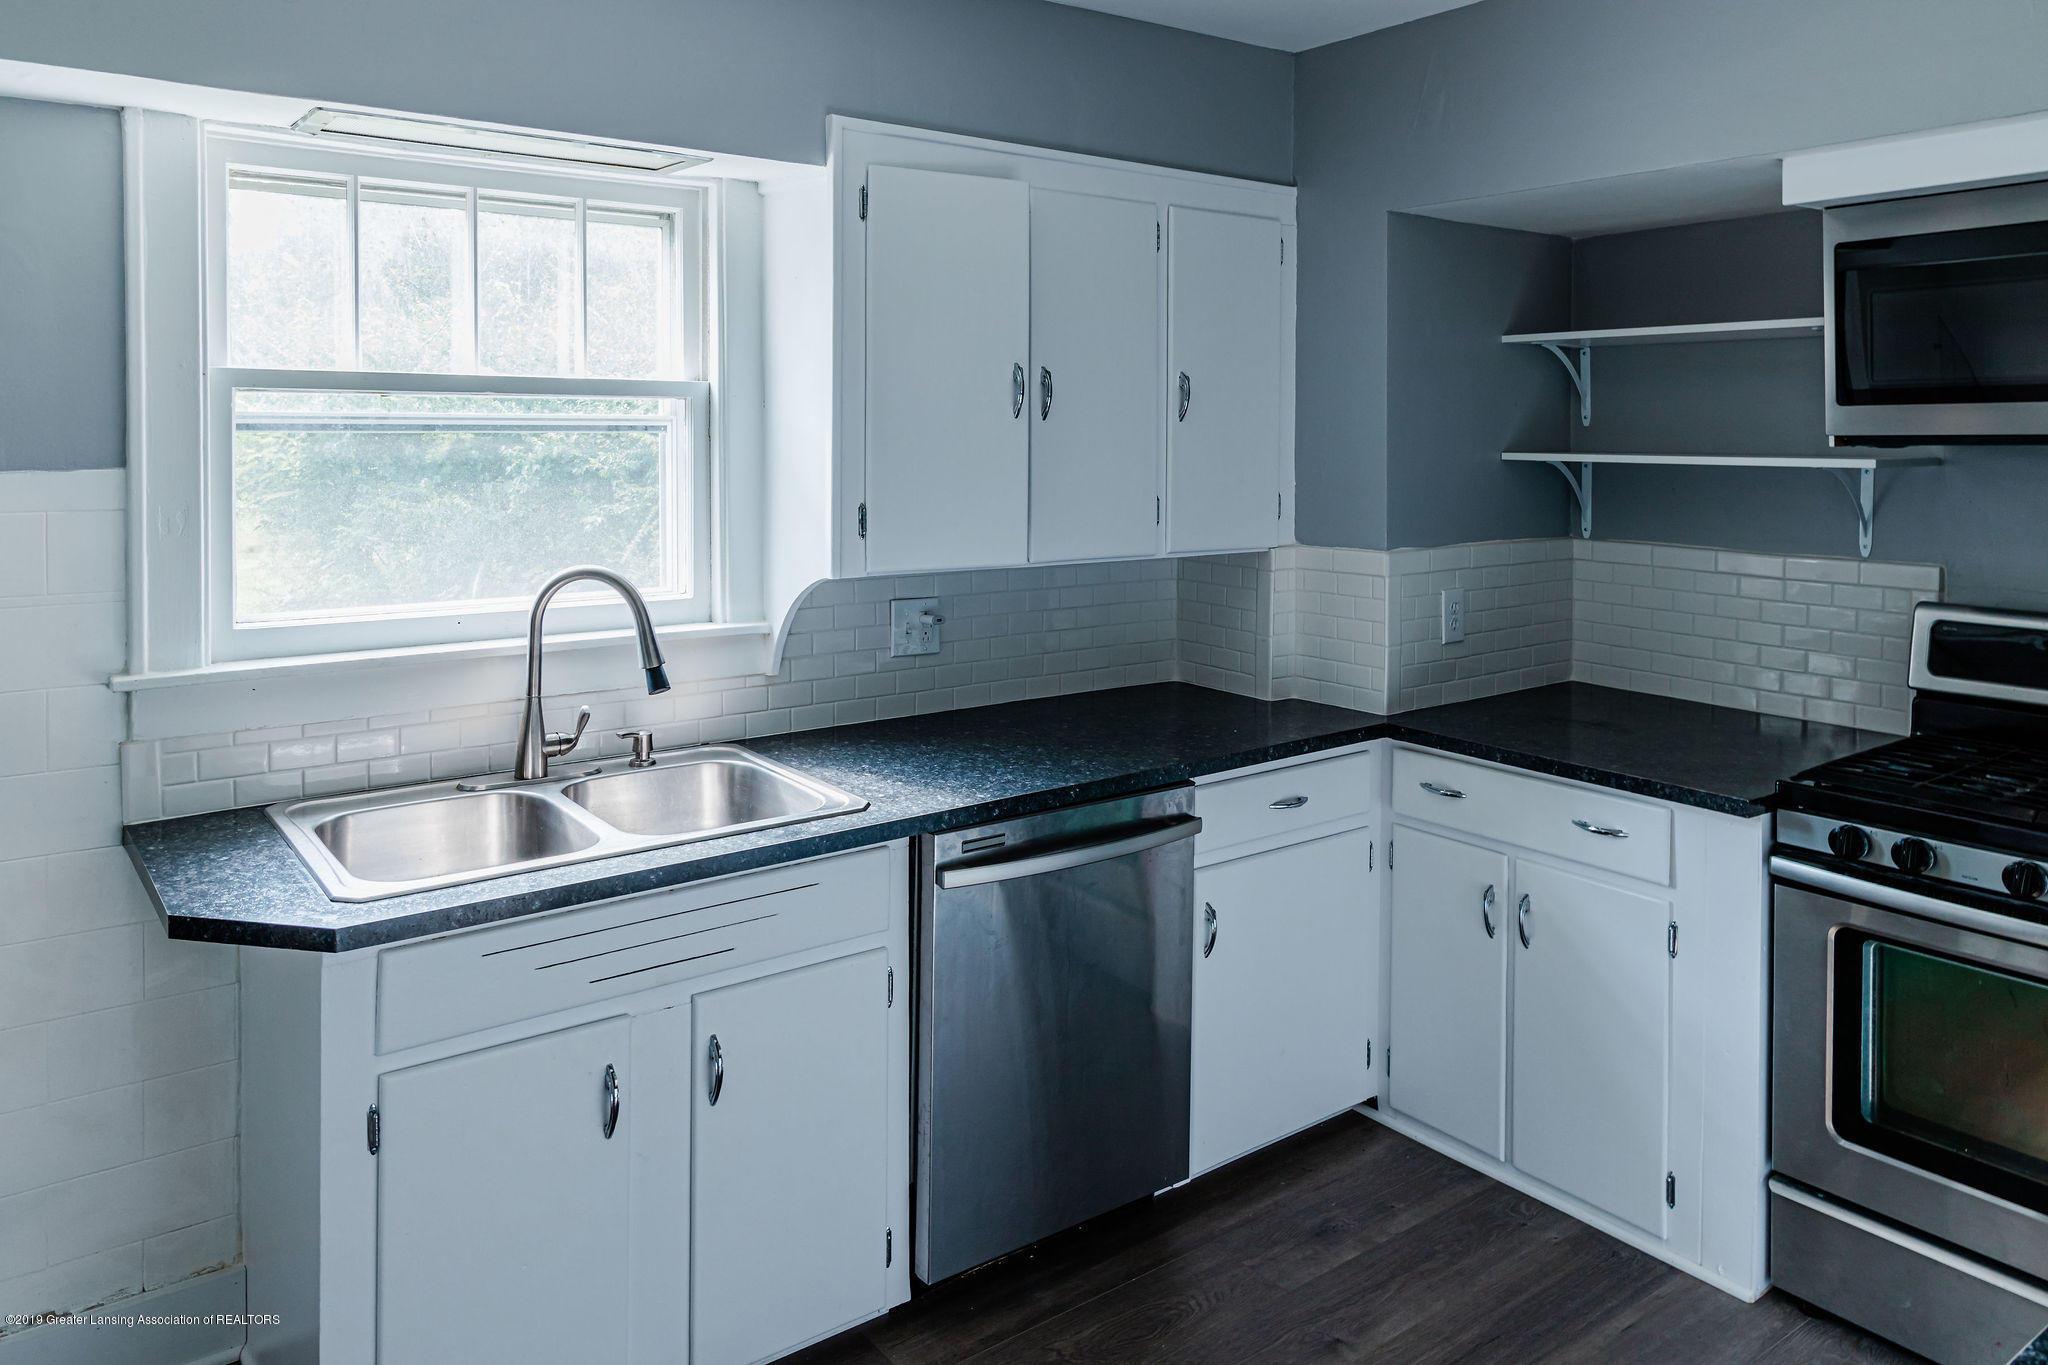 219 Oakland Dr - kitchen - 7